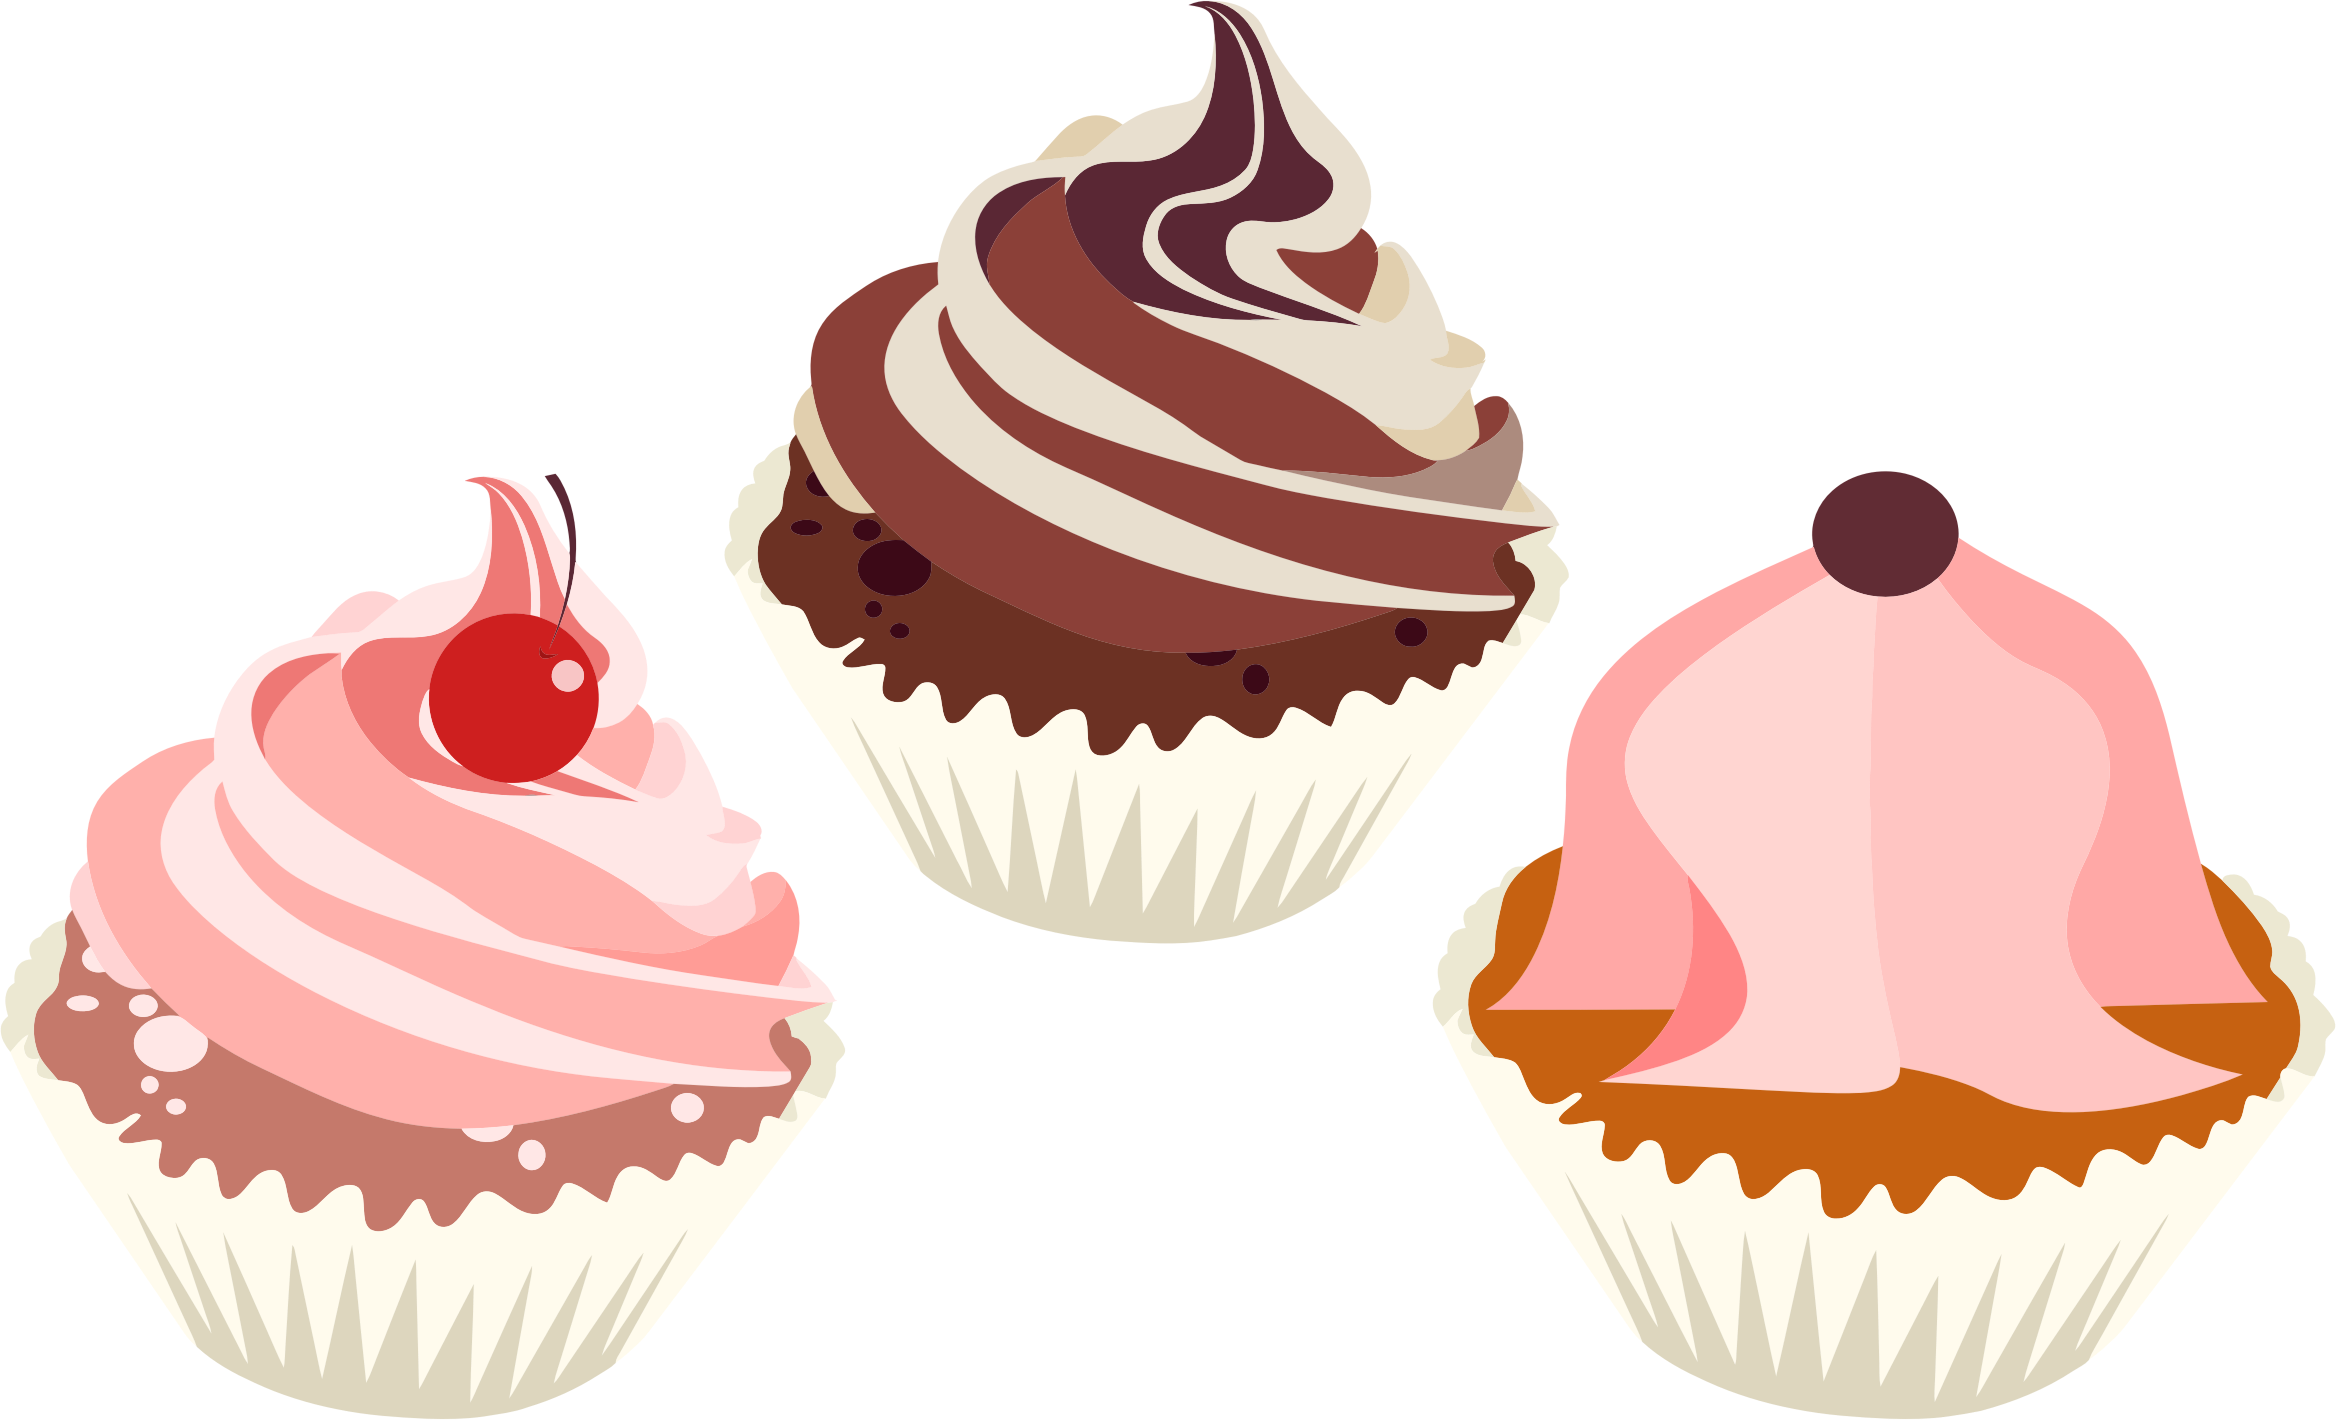 Desserts clipart cupcake. Three delicious cupcakes big